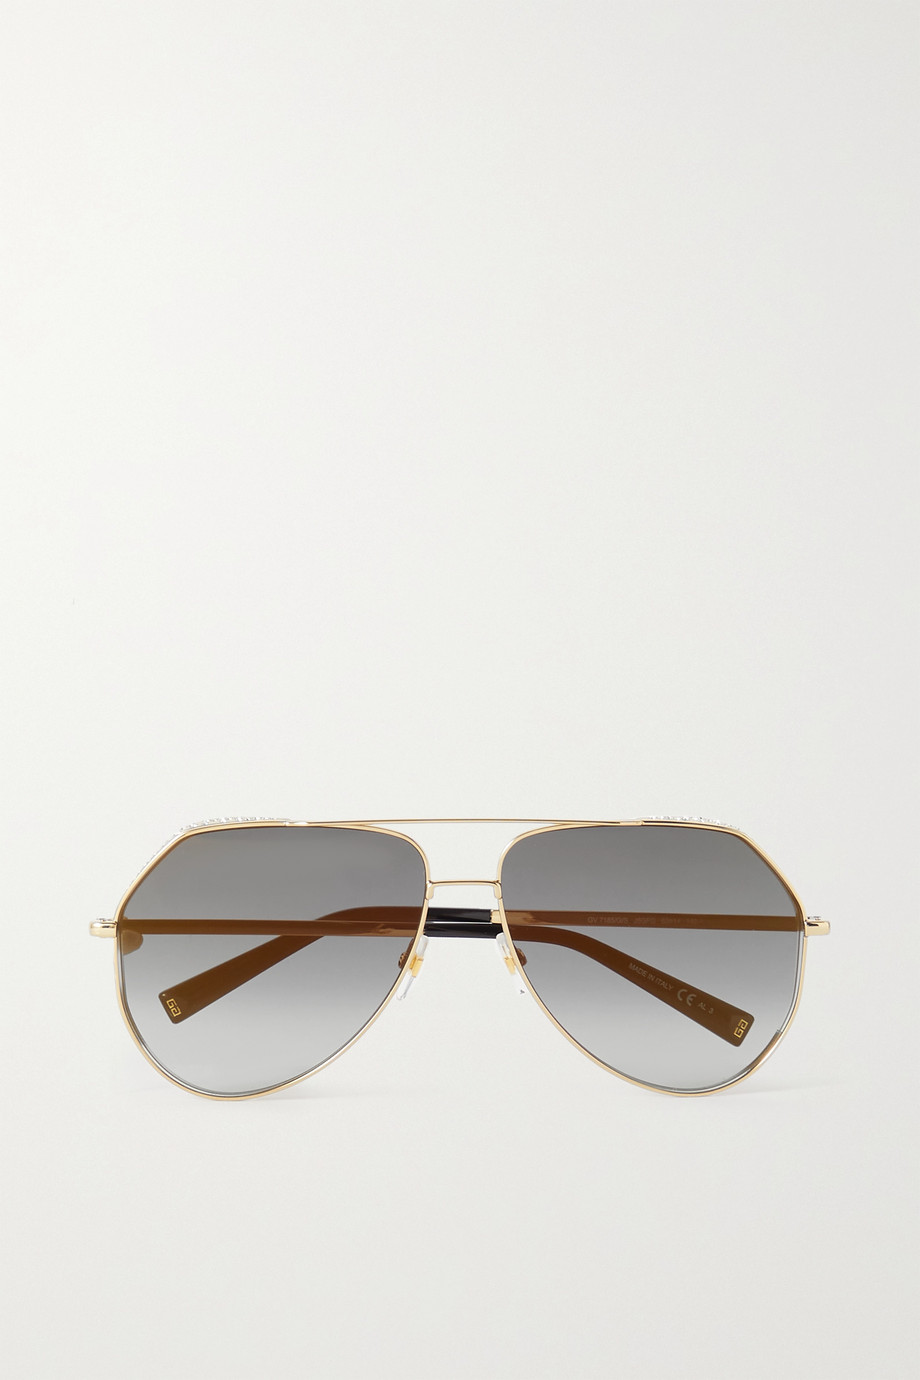 Givenchy Aviator-style crystal-embellished gold-tone sunglasses